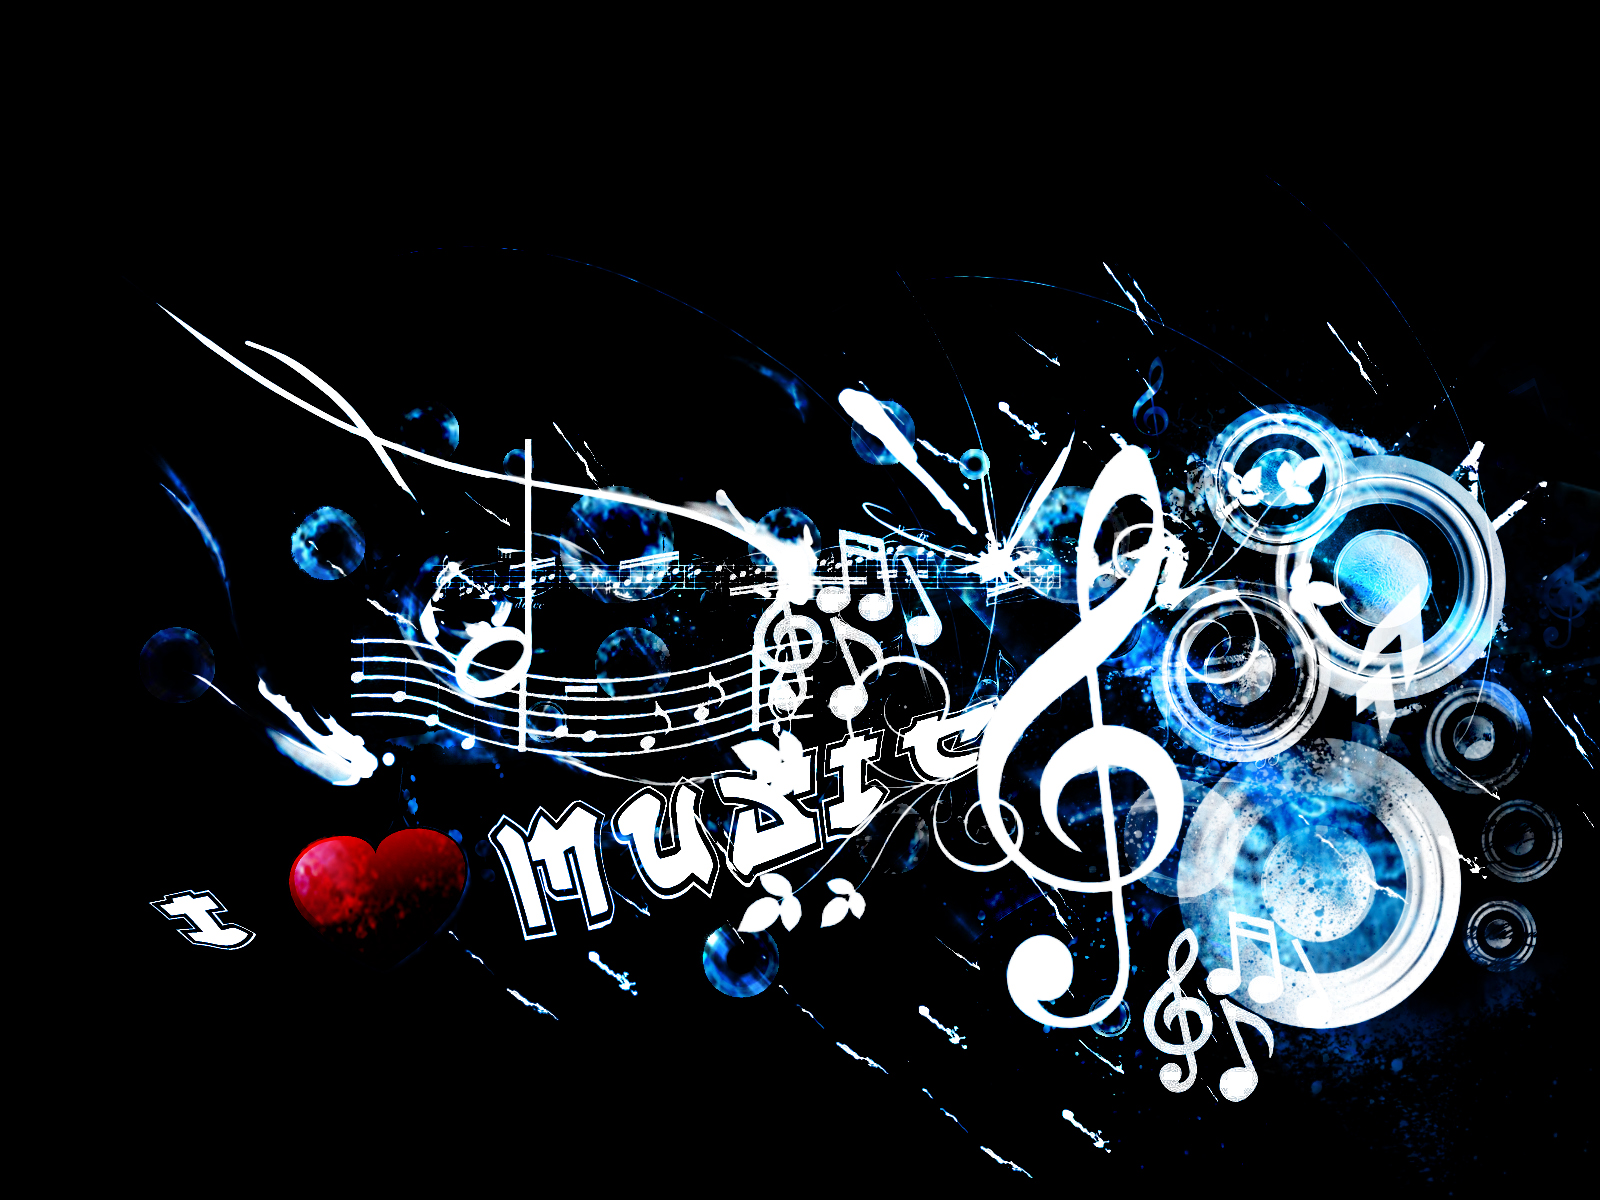 music hd wallpapers hd music screensavers desktop wallpapers wide